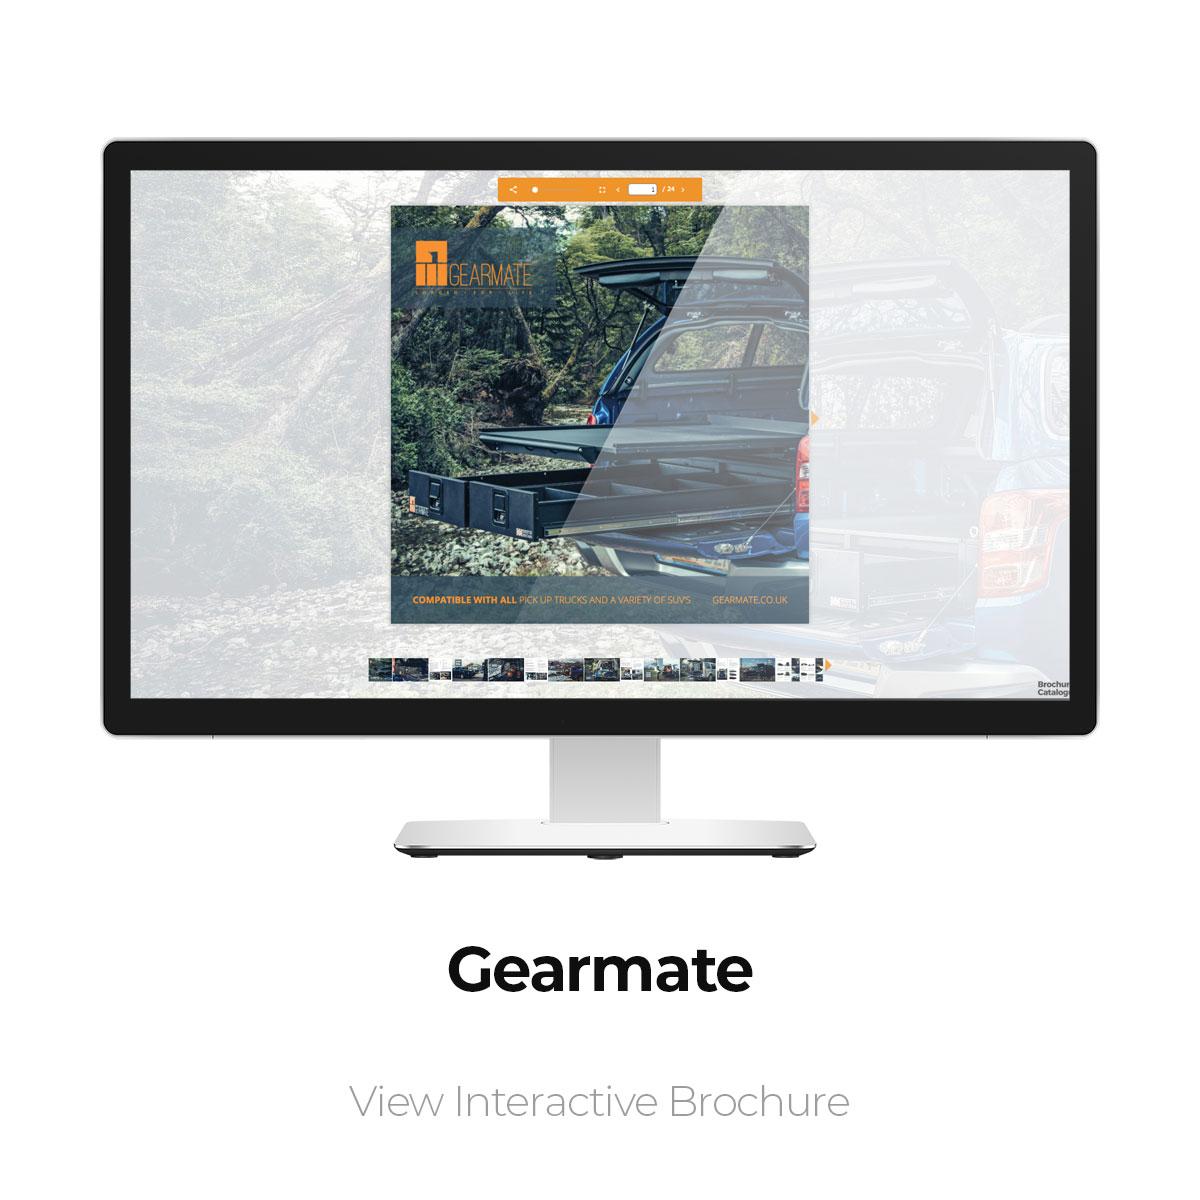 Gearmate Interactive Brochure